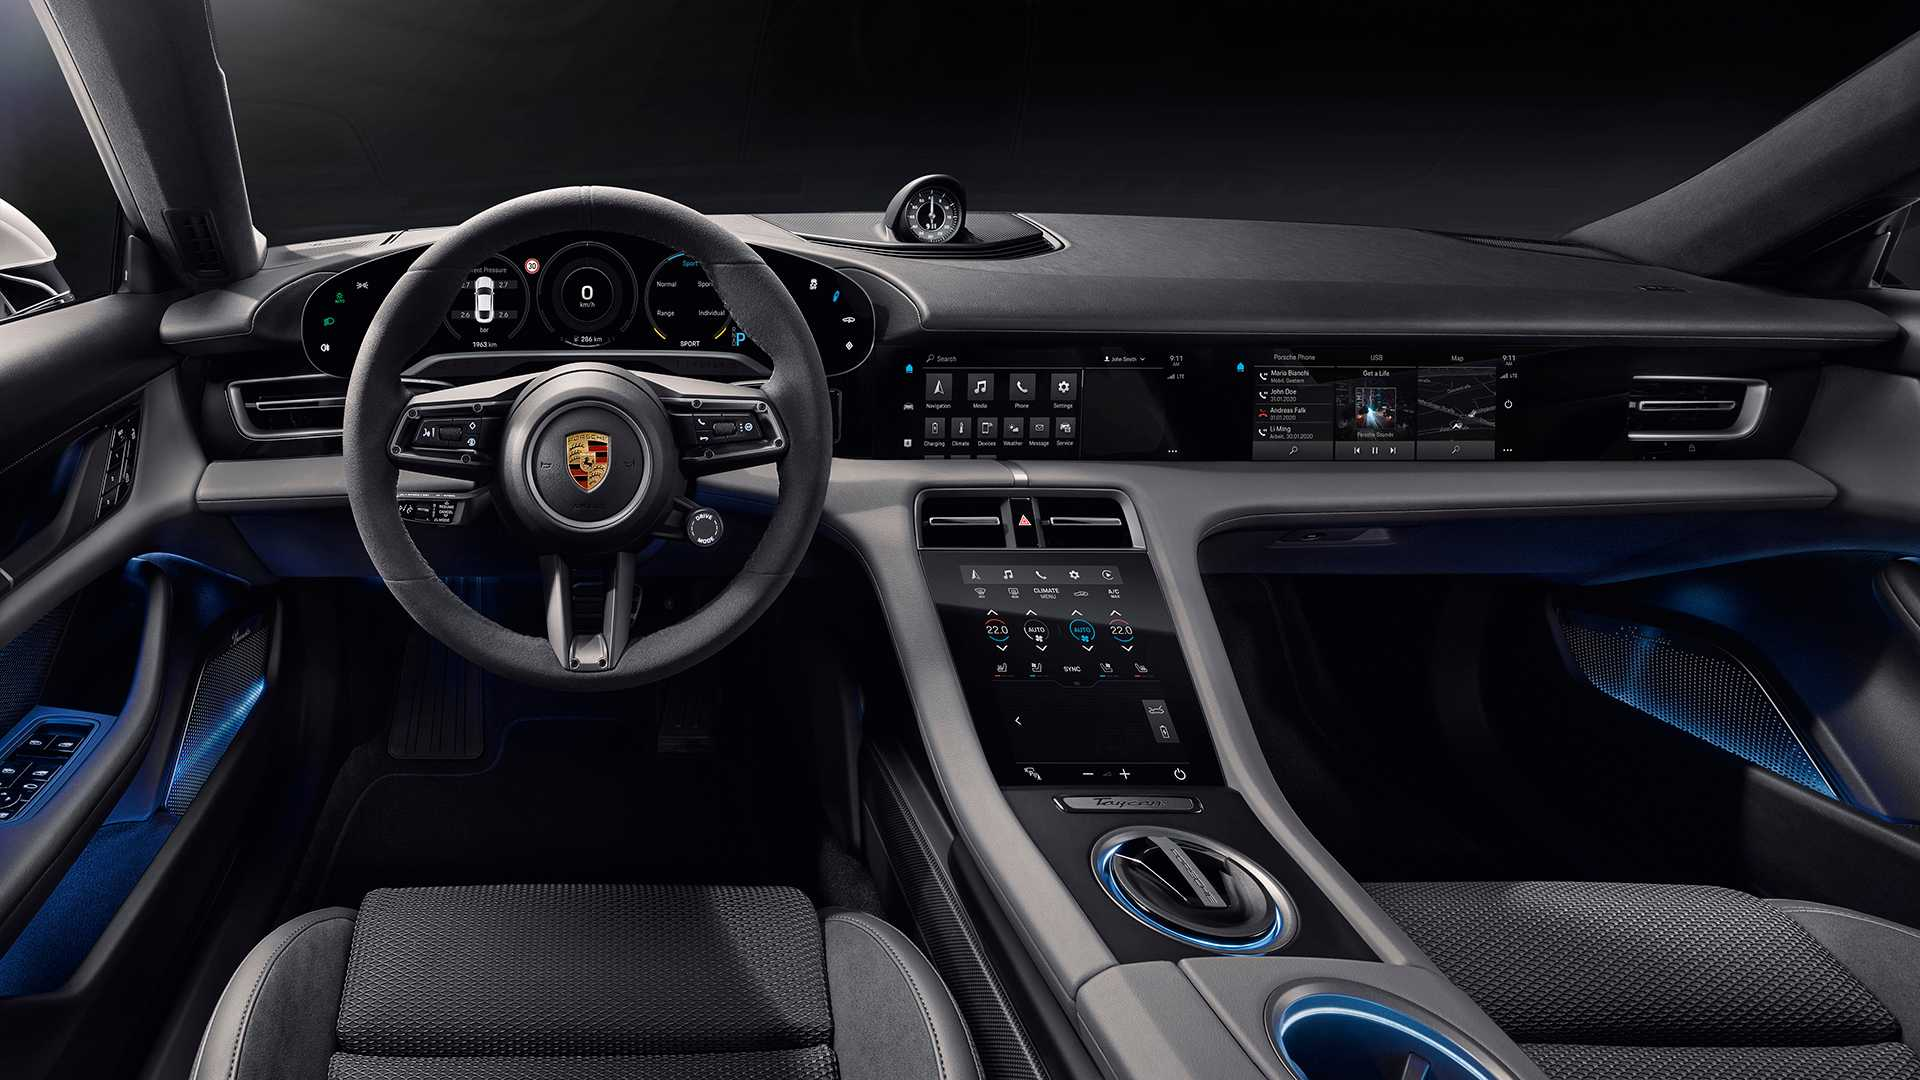 Porsche Taycan Interior Revealed Even Gives Passenger A Screen 1920x1080